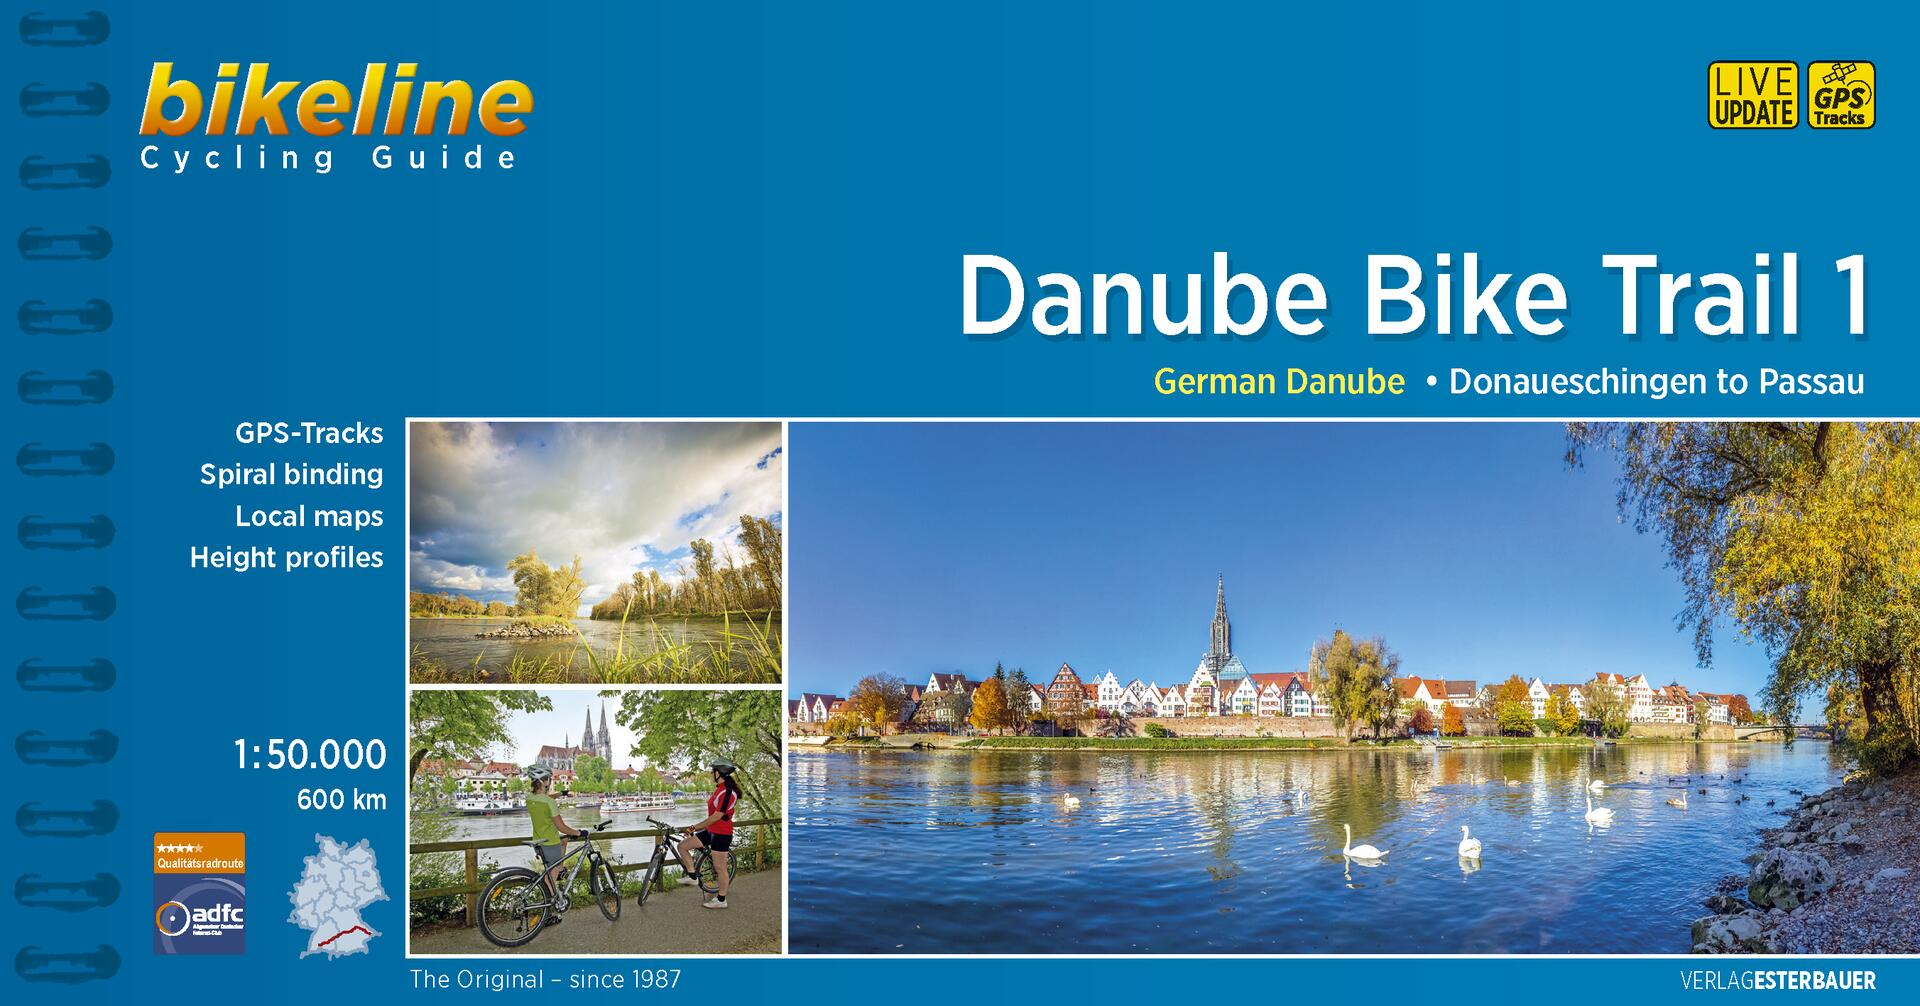 Foto vom Danube Bike Trail 1